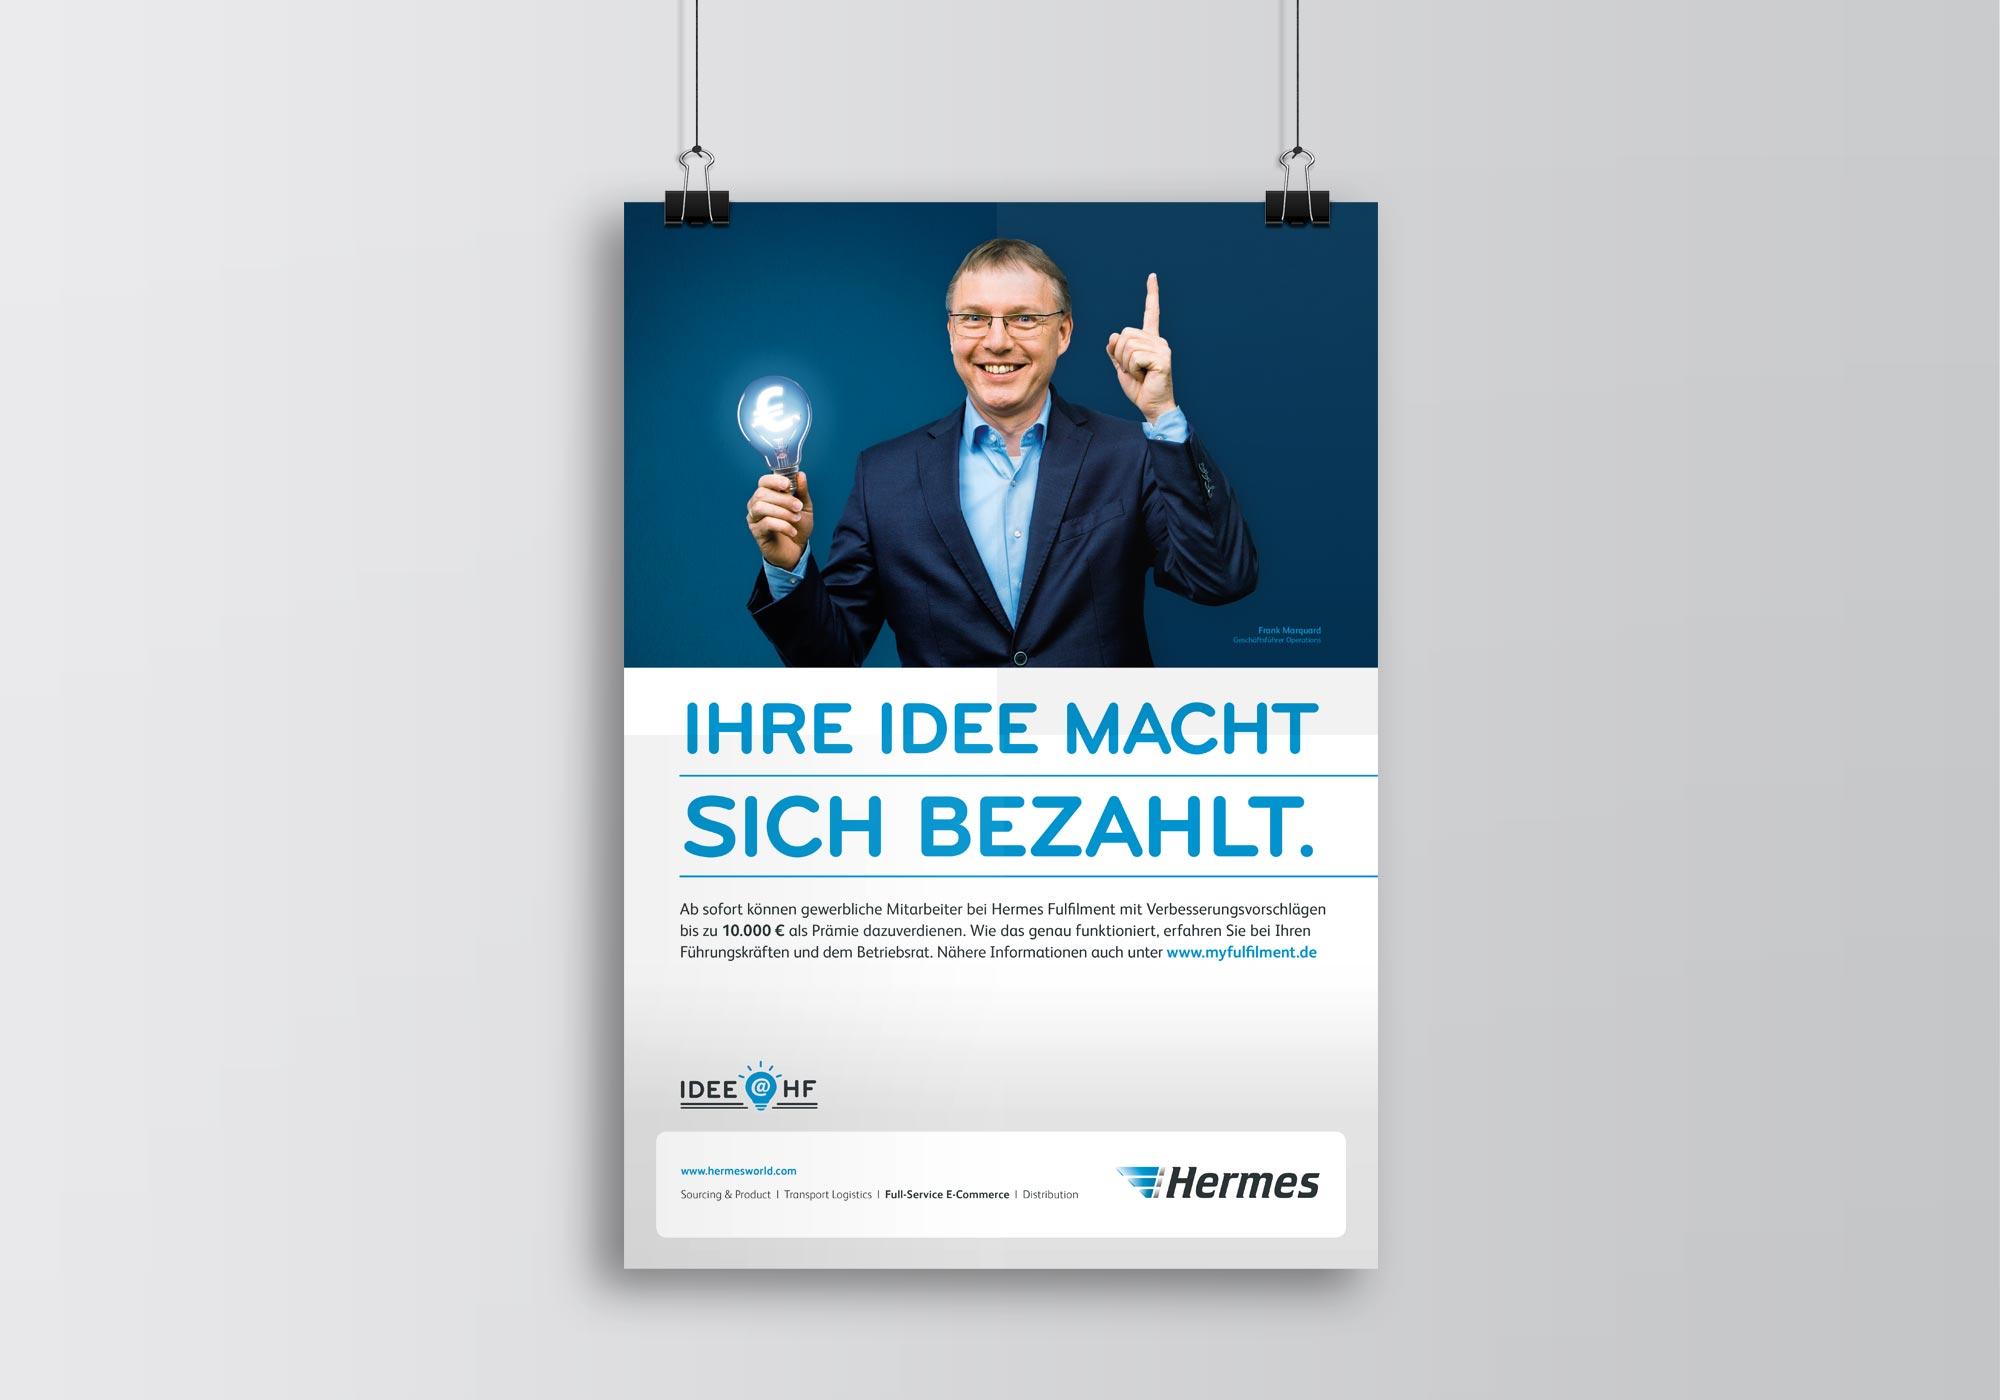 001_Idee@HF_Poster